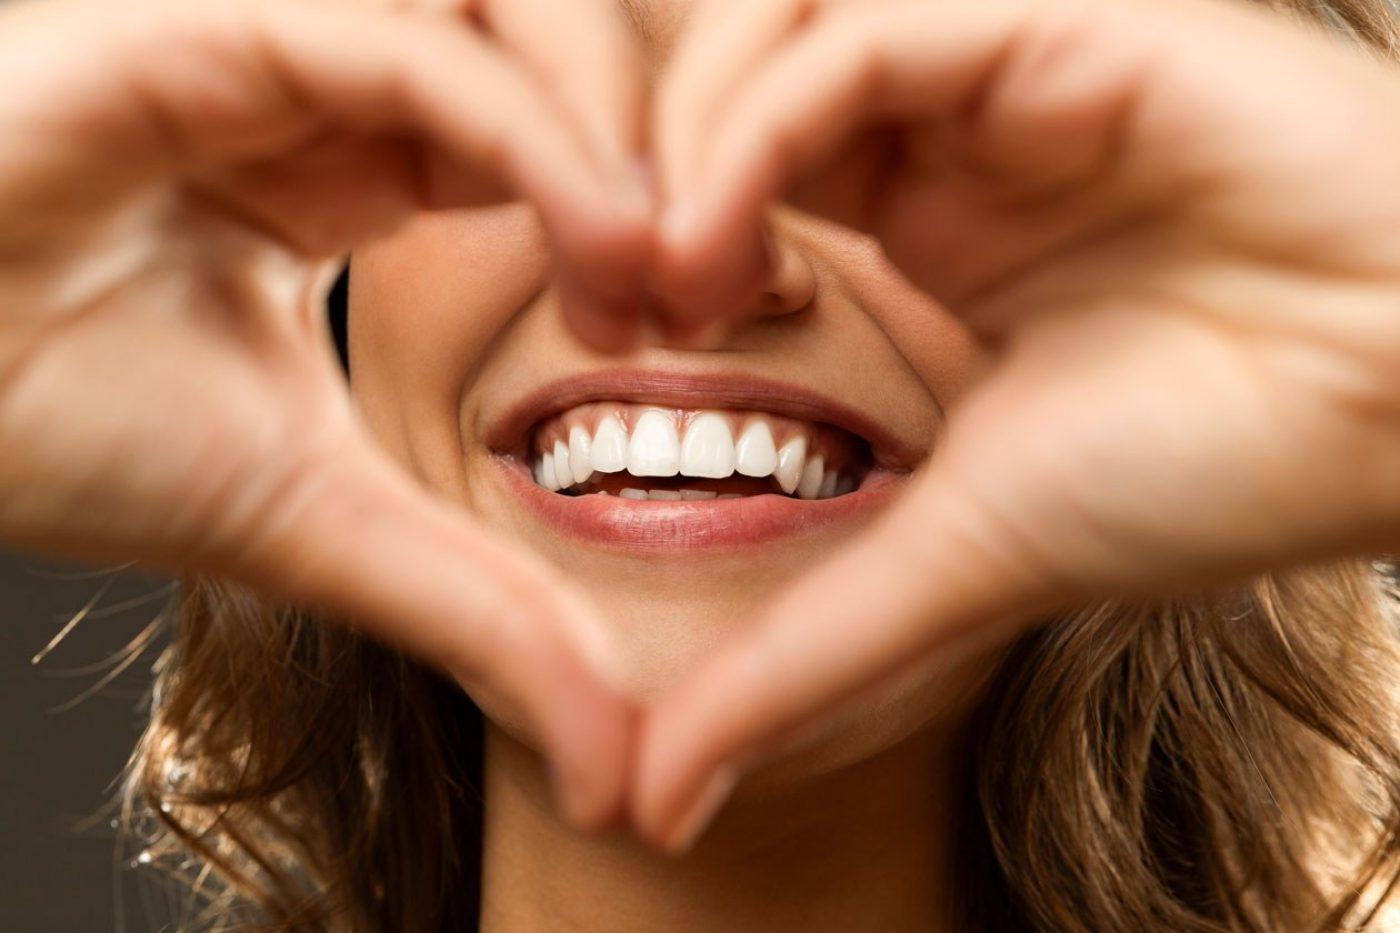 Bay View Replacing Teeth Bridges